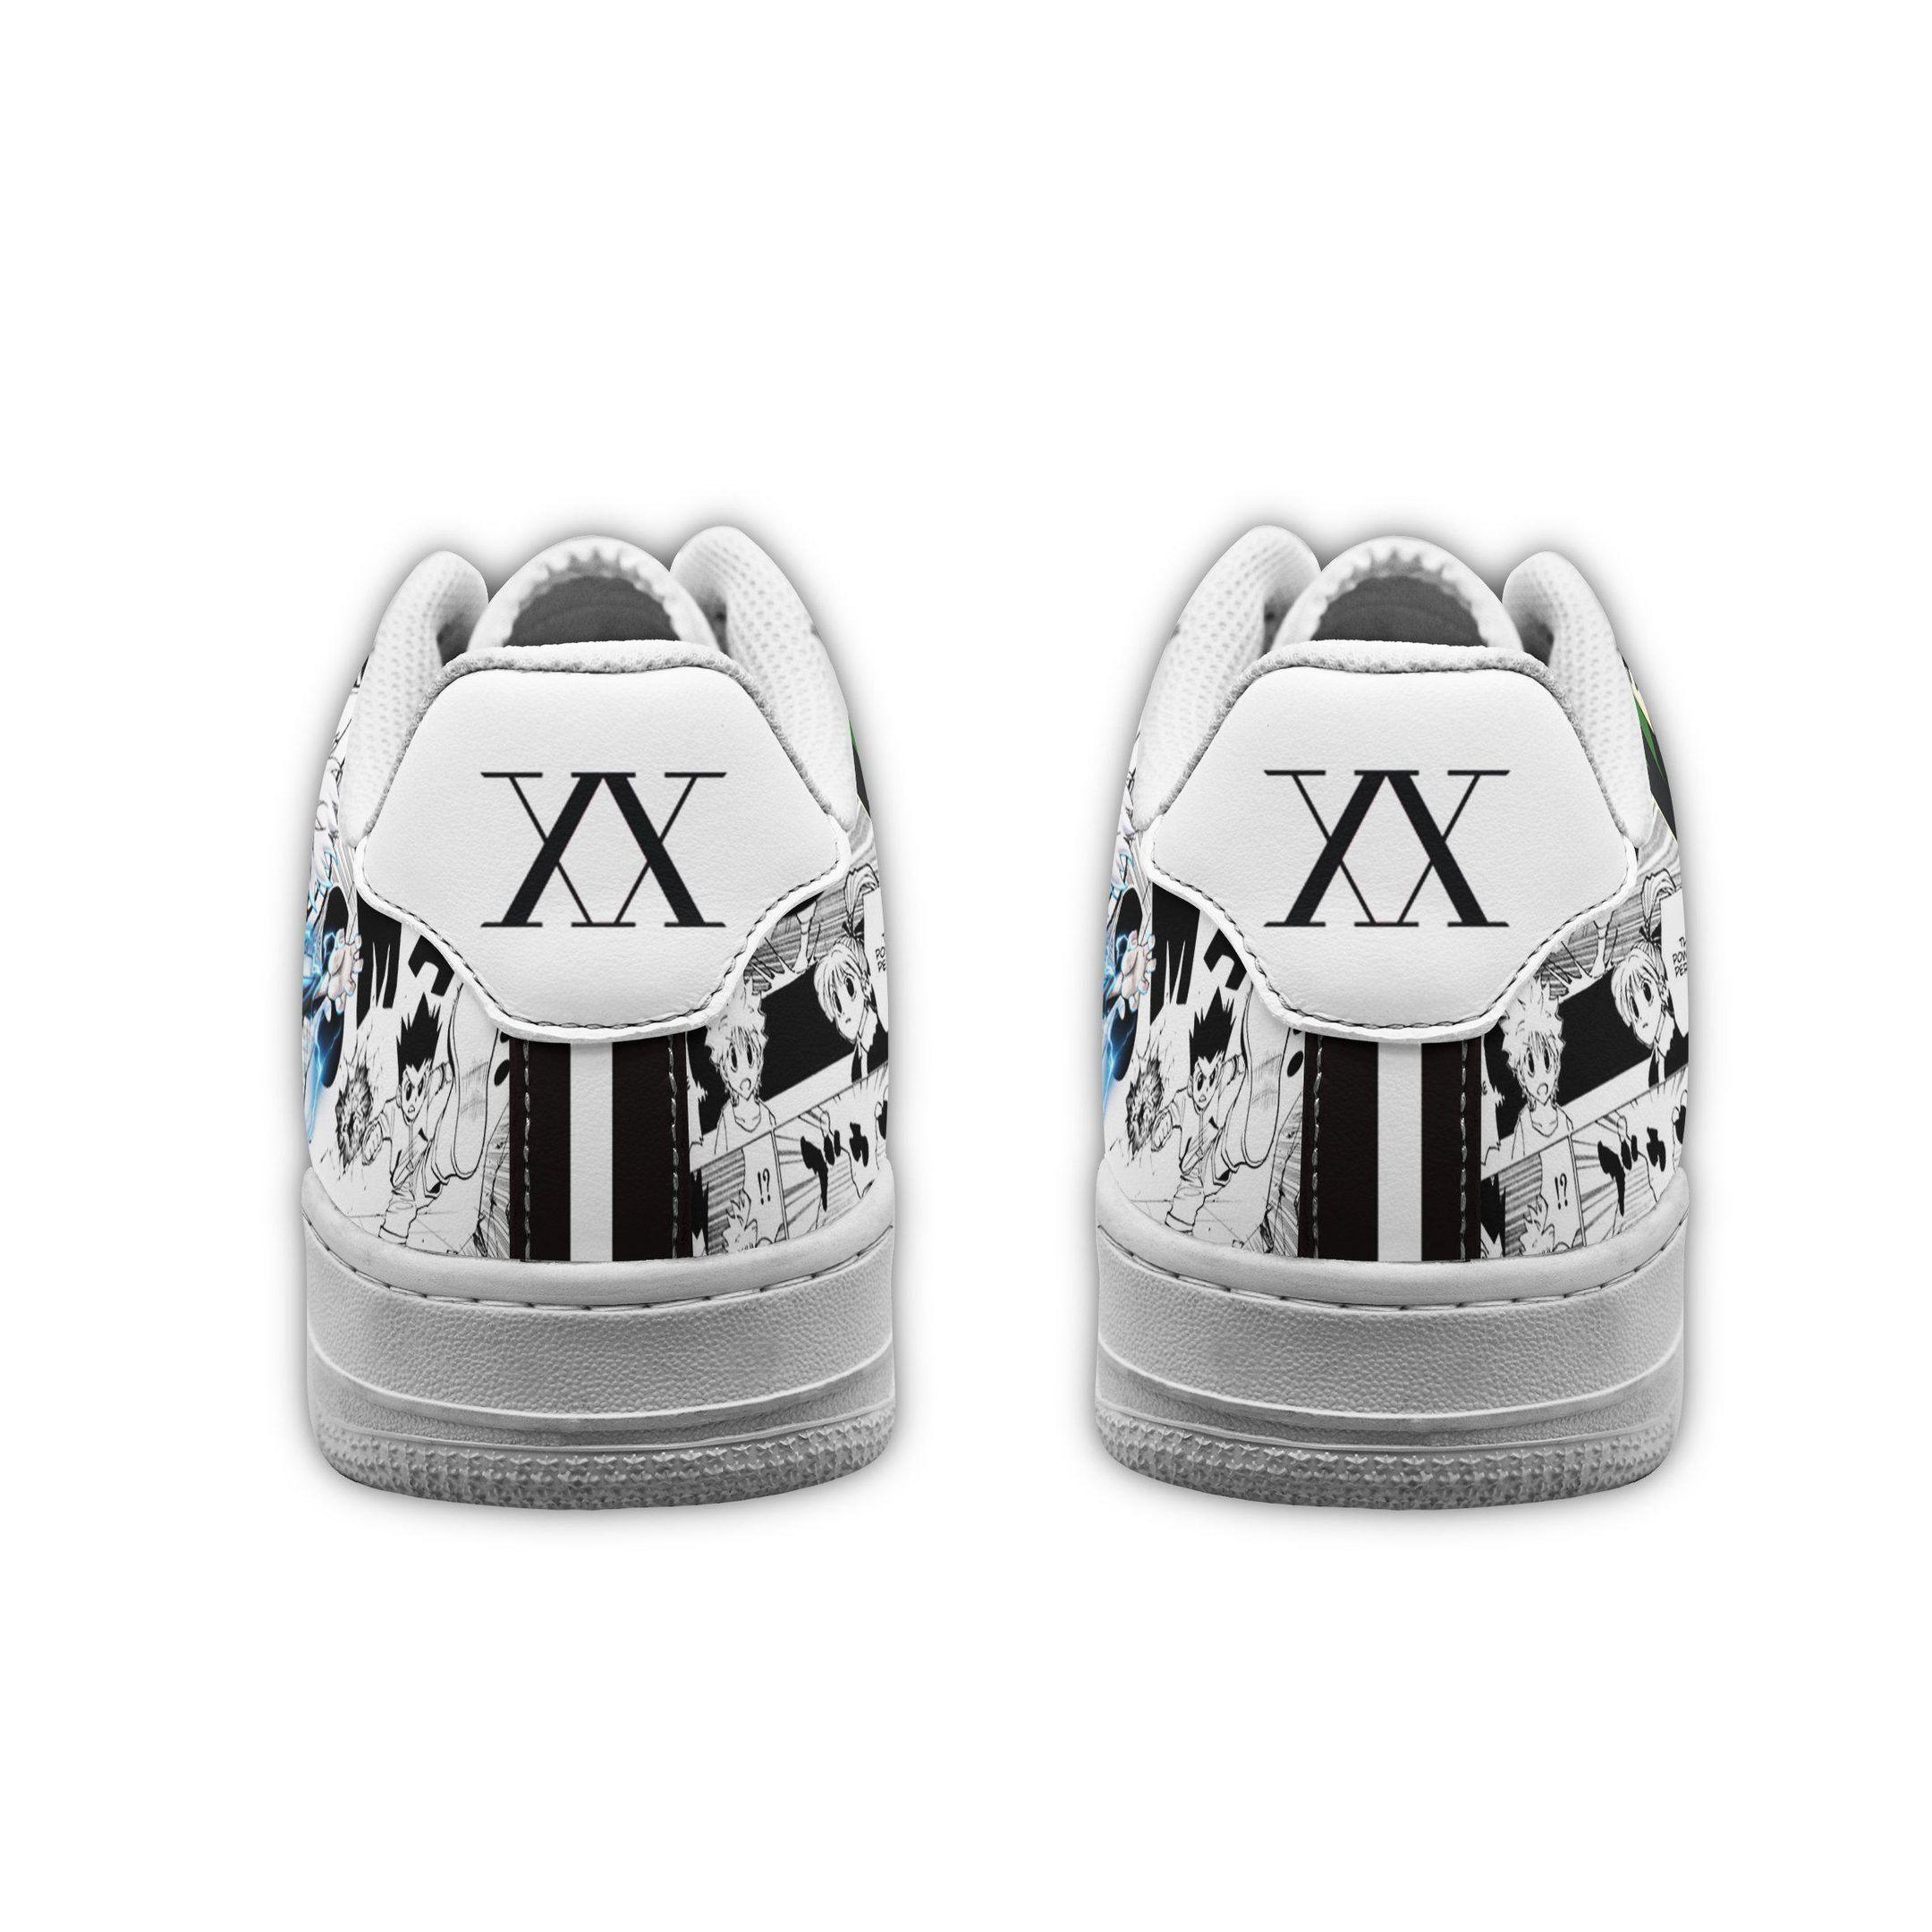 Hunter X Hunter Air Sneakers HxH Custom Anime Shoes GO1012